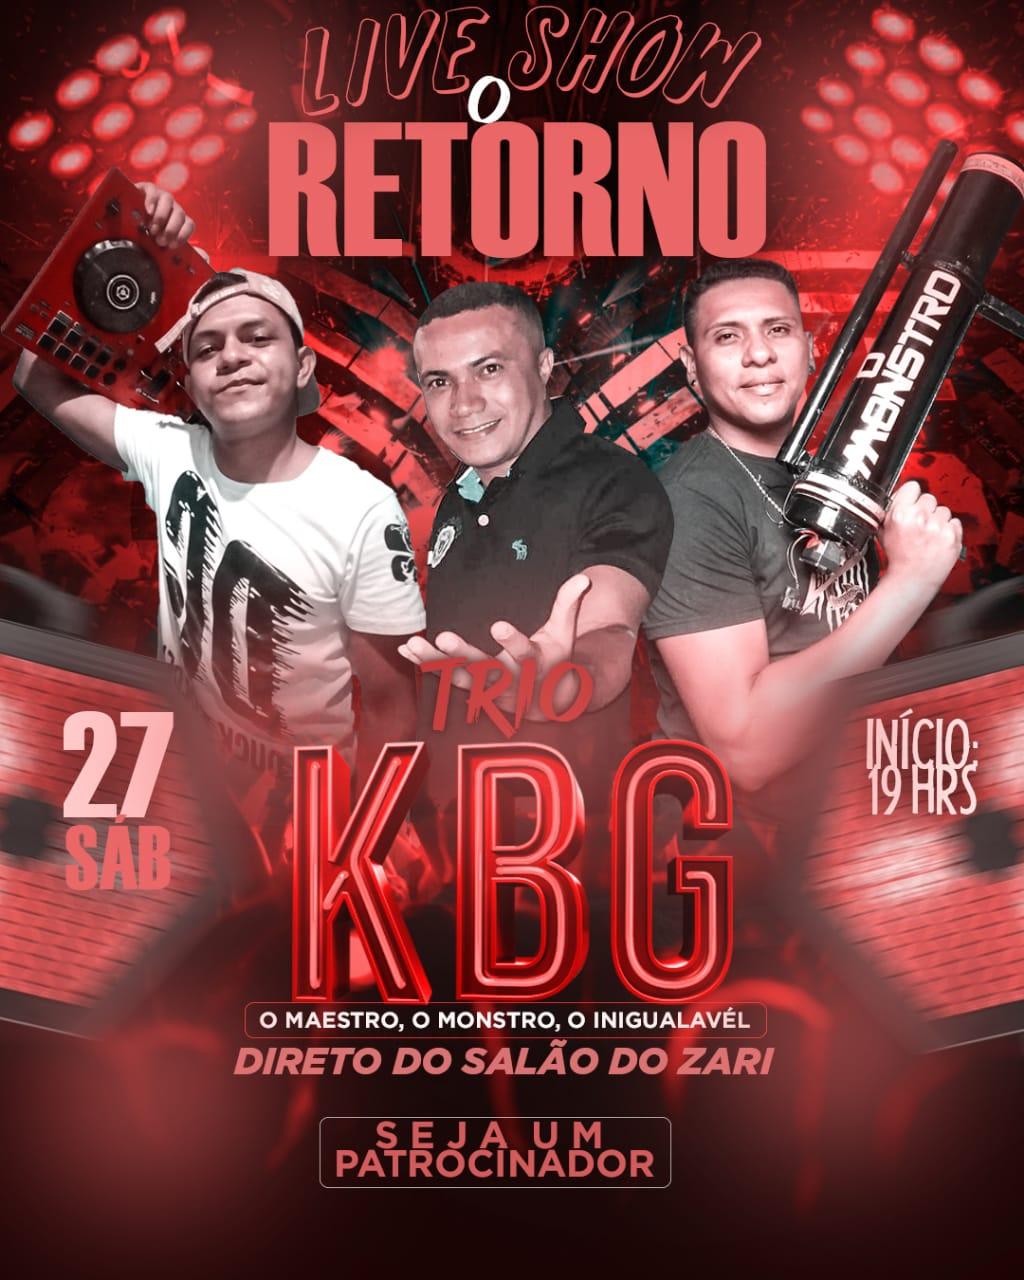 CD DJ BRUNO MARAJOARA O RETORNO SALÃO DO ZARI